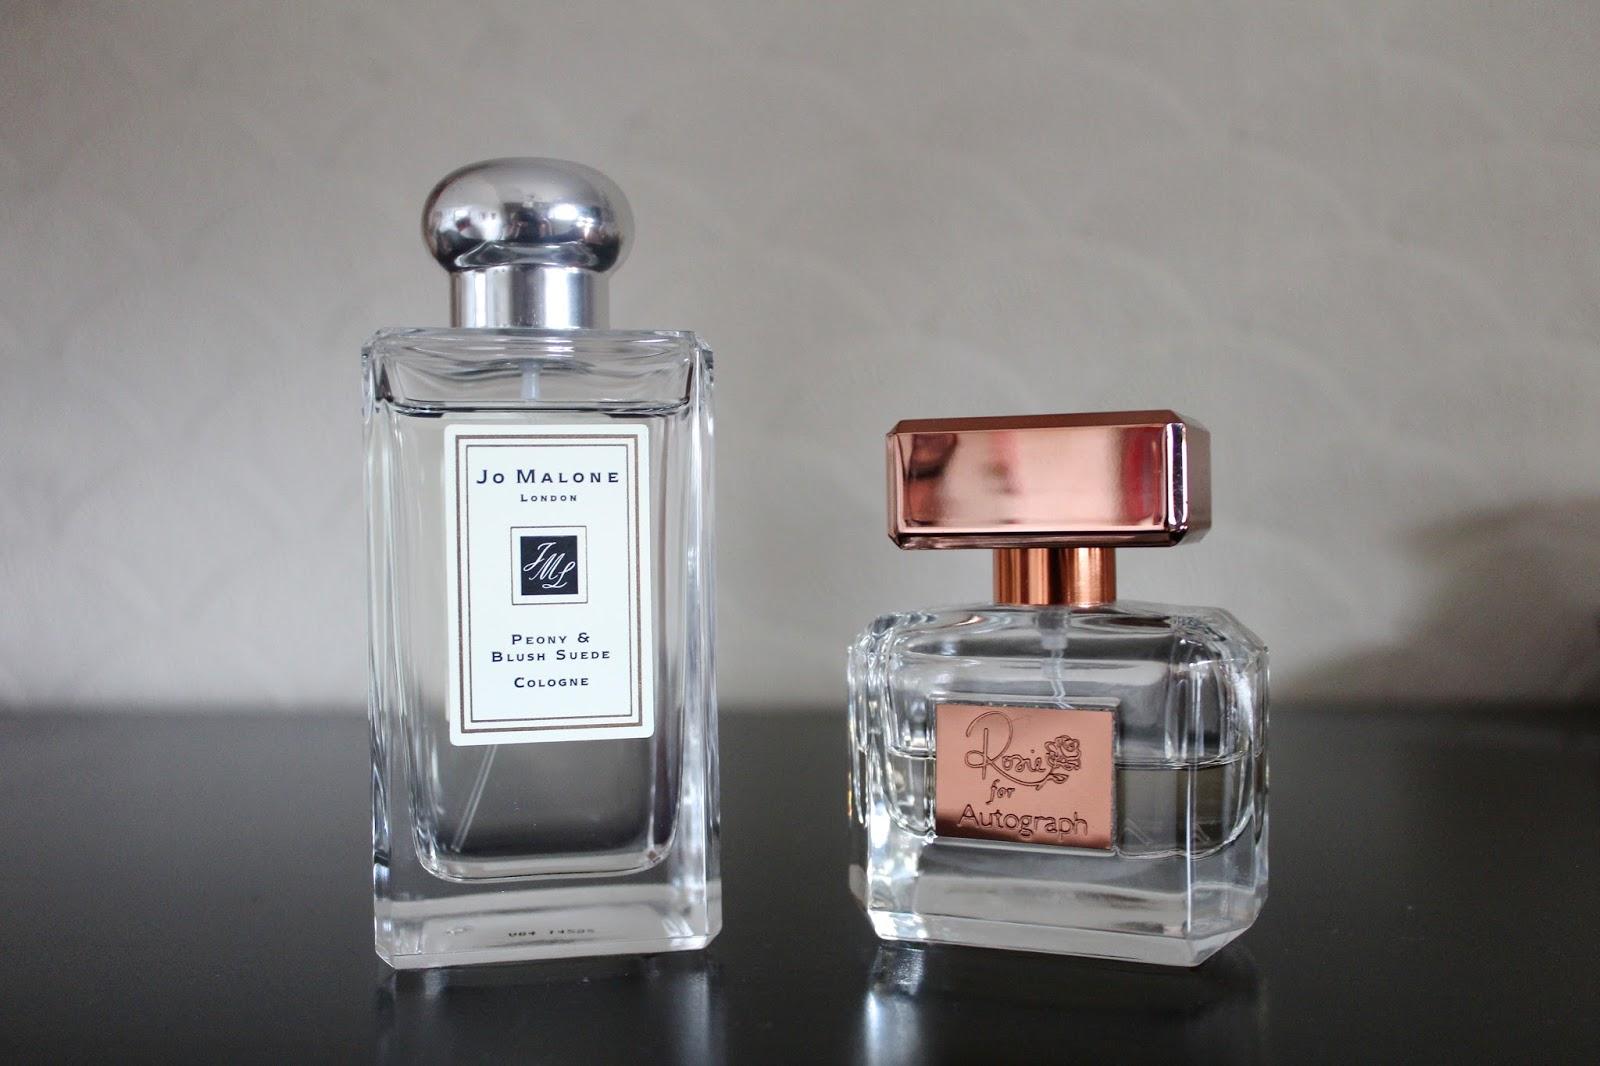 https://www.kirstiepickering.com/2015/06/summer-fragrance-additions.html